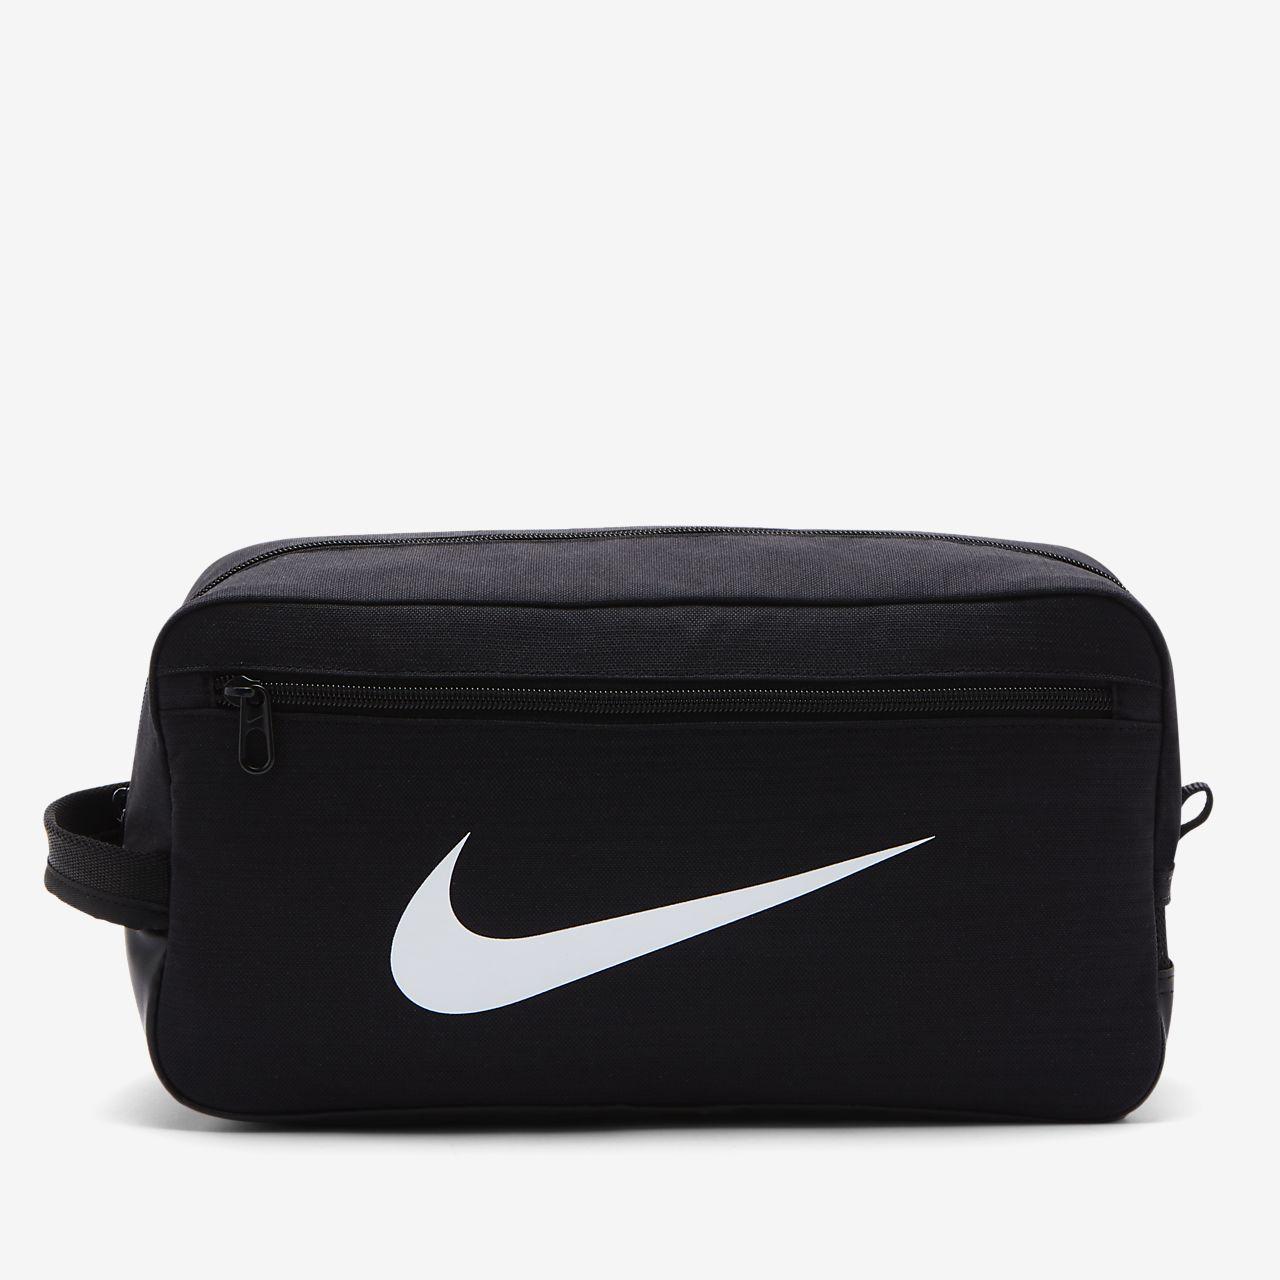 1852d4e39c93c2 Nike Brasilia Training Shoe Bag. Nike.com GB